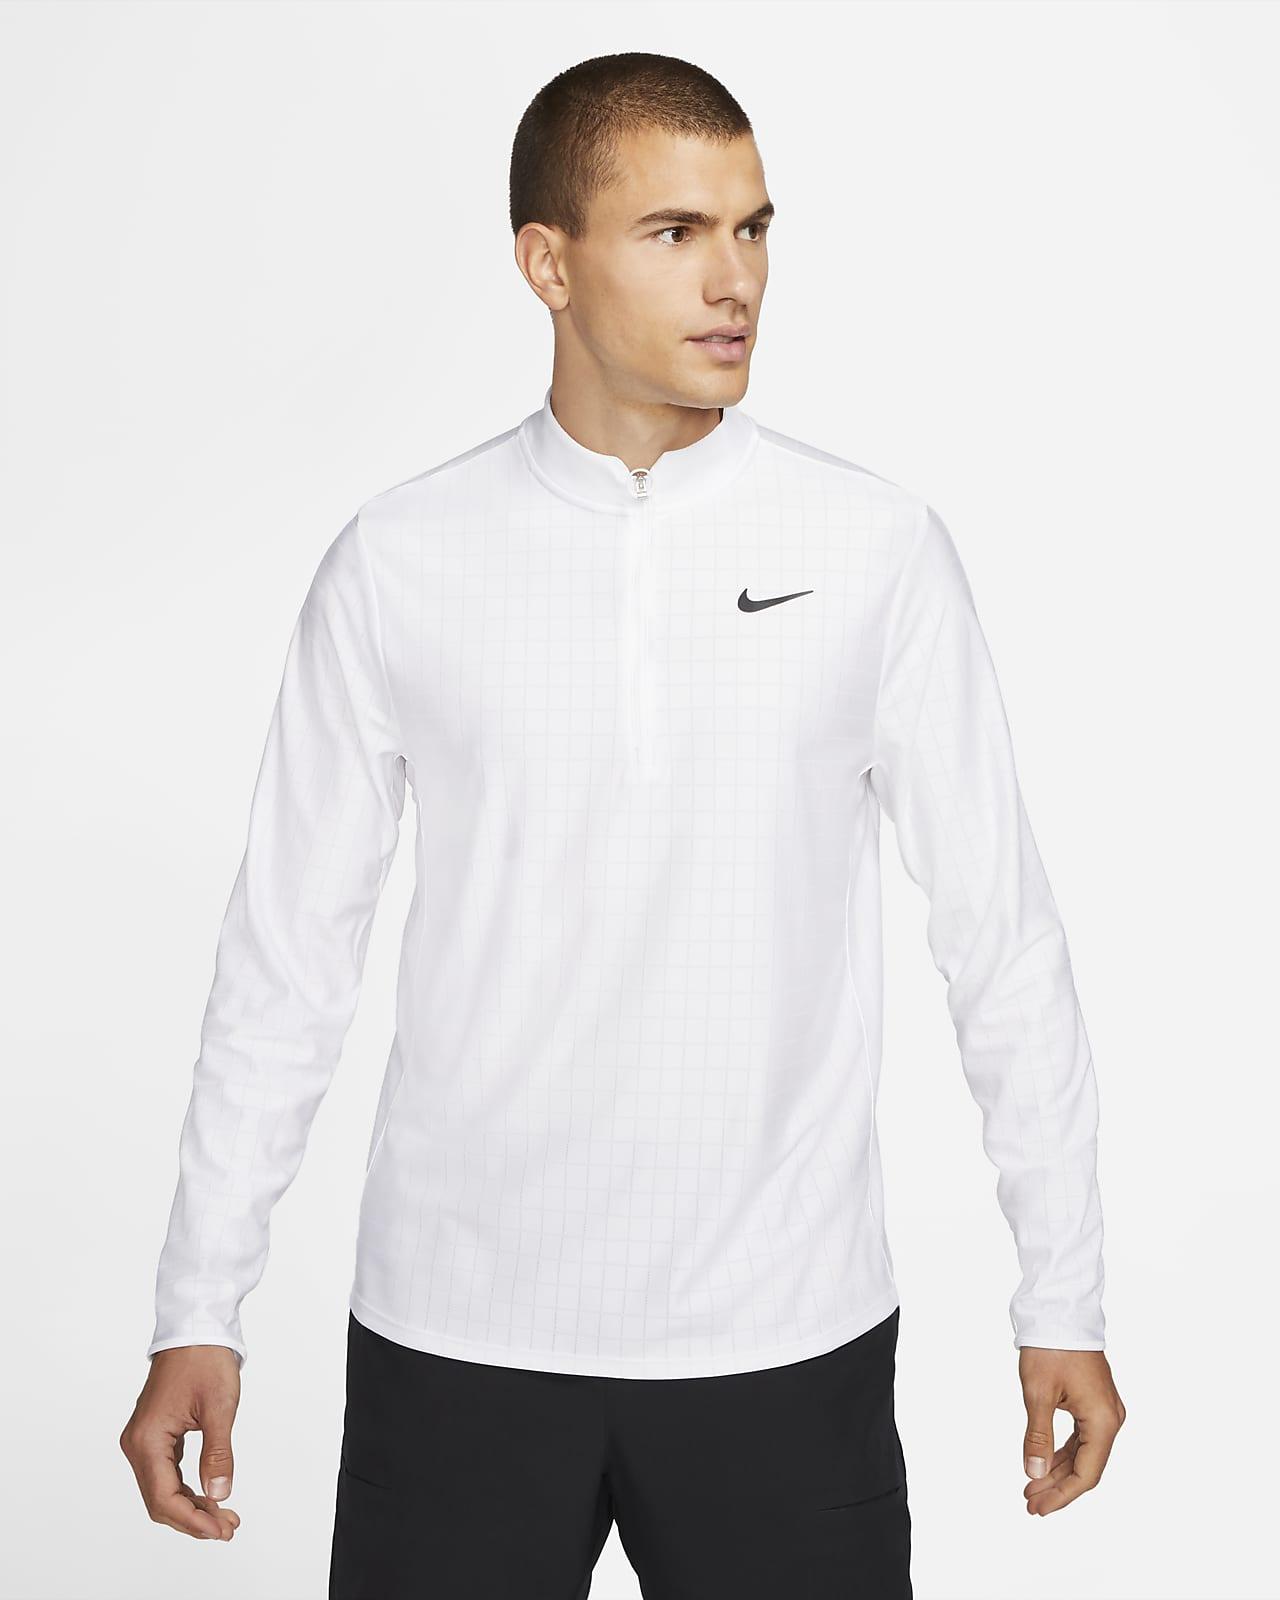 NikeCourt Dri-FIT Advantage Men's 1/2-Zip Tennis Top